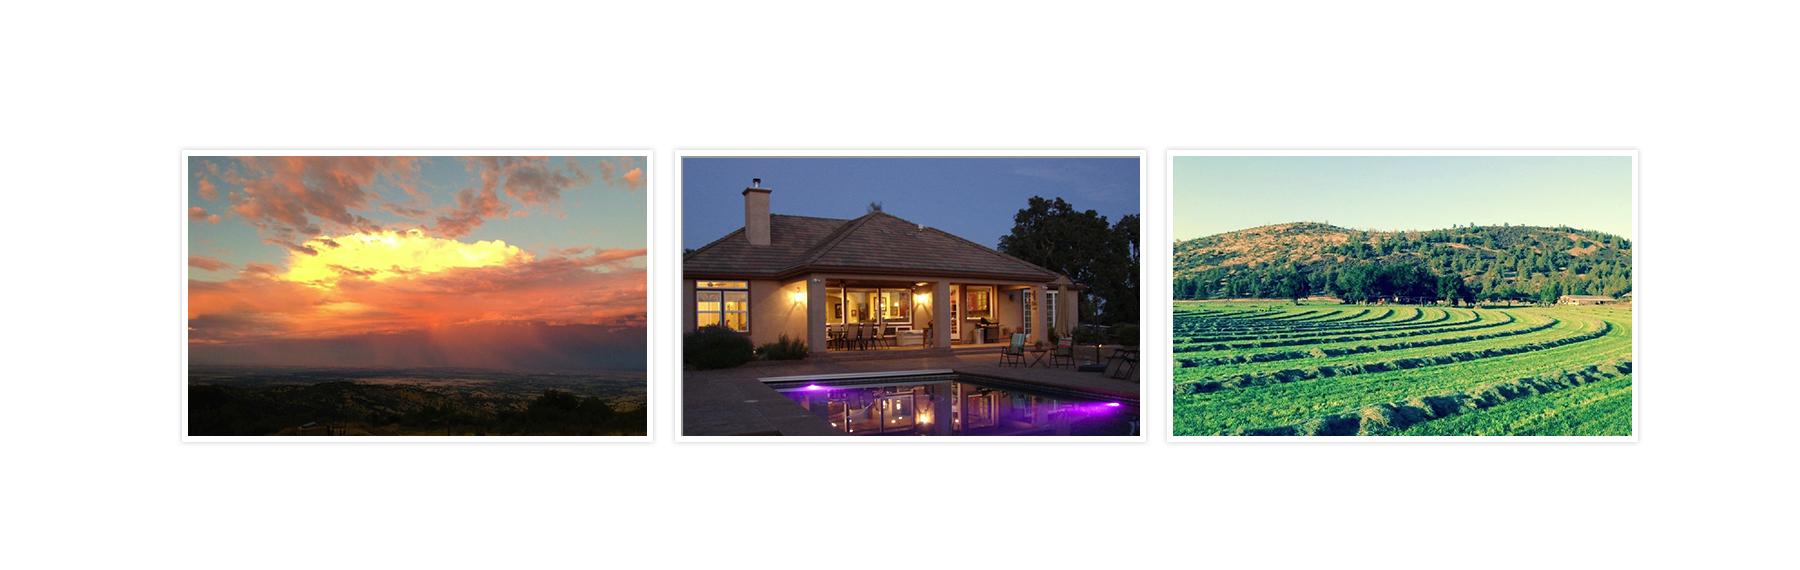 Landscape photo, house photo, and farm field photo